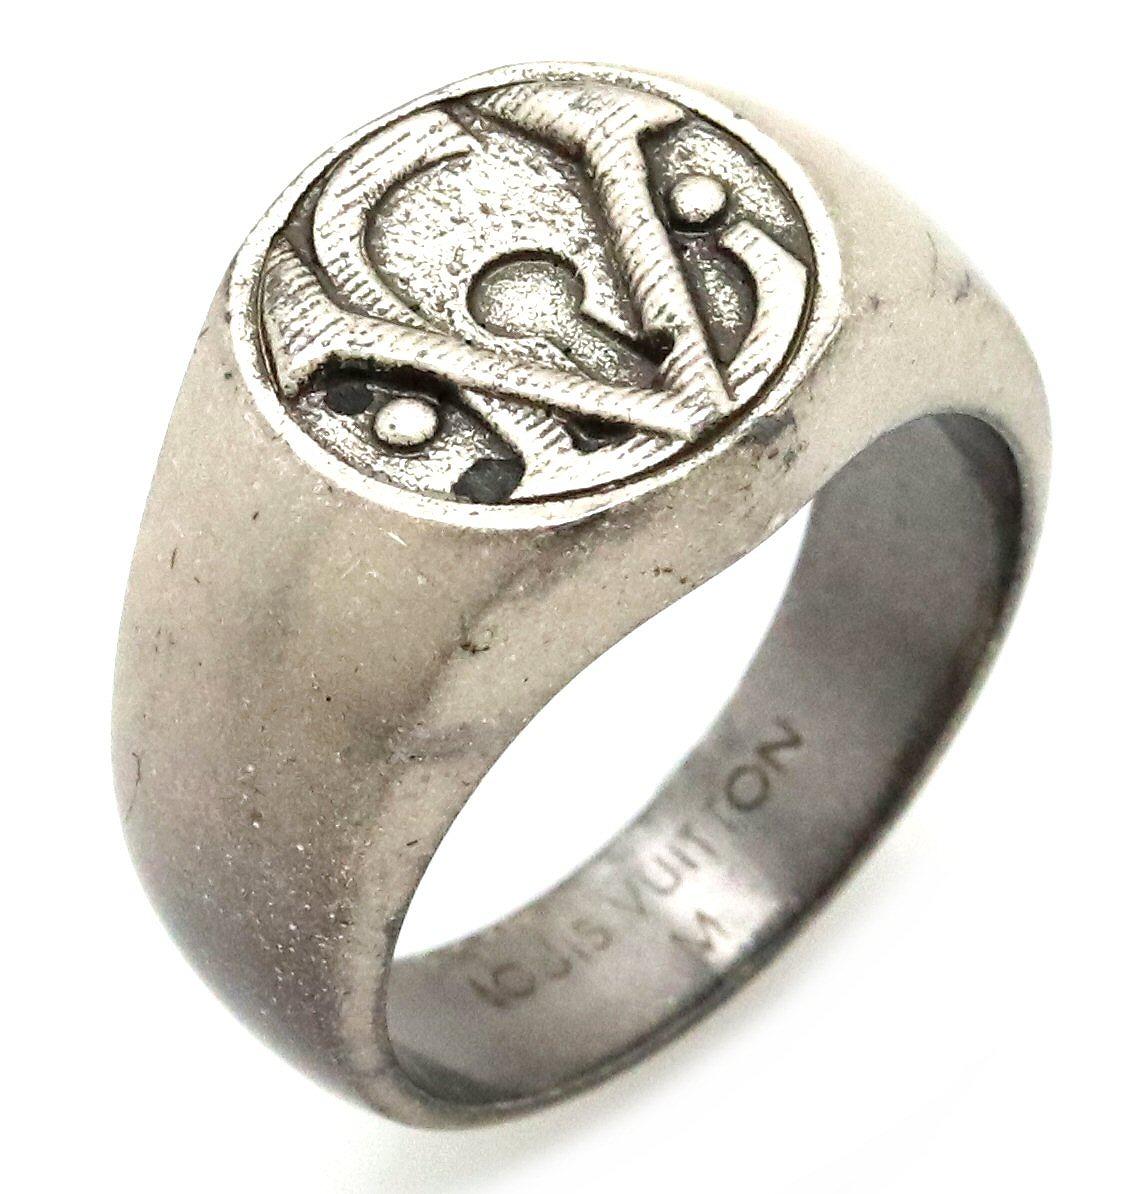 LOUIS VUITTON ルイ ヴィトン ロゴ リング 指輪 シルバー色 #20 20号 M 【中古】